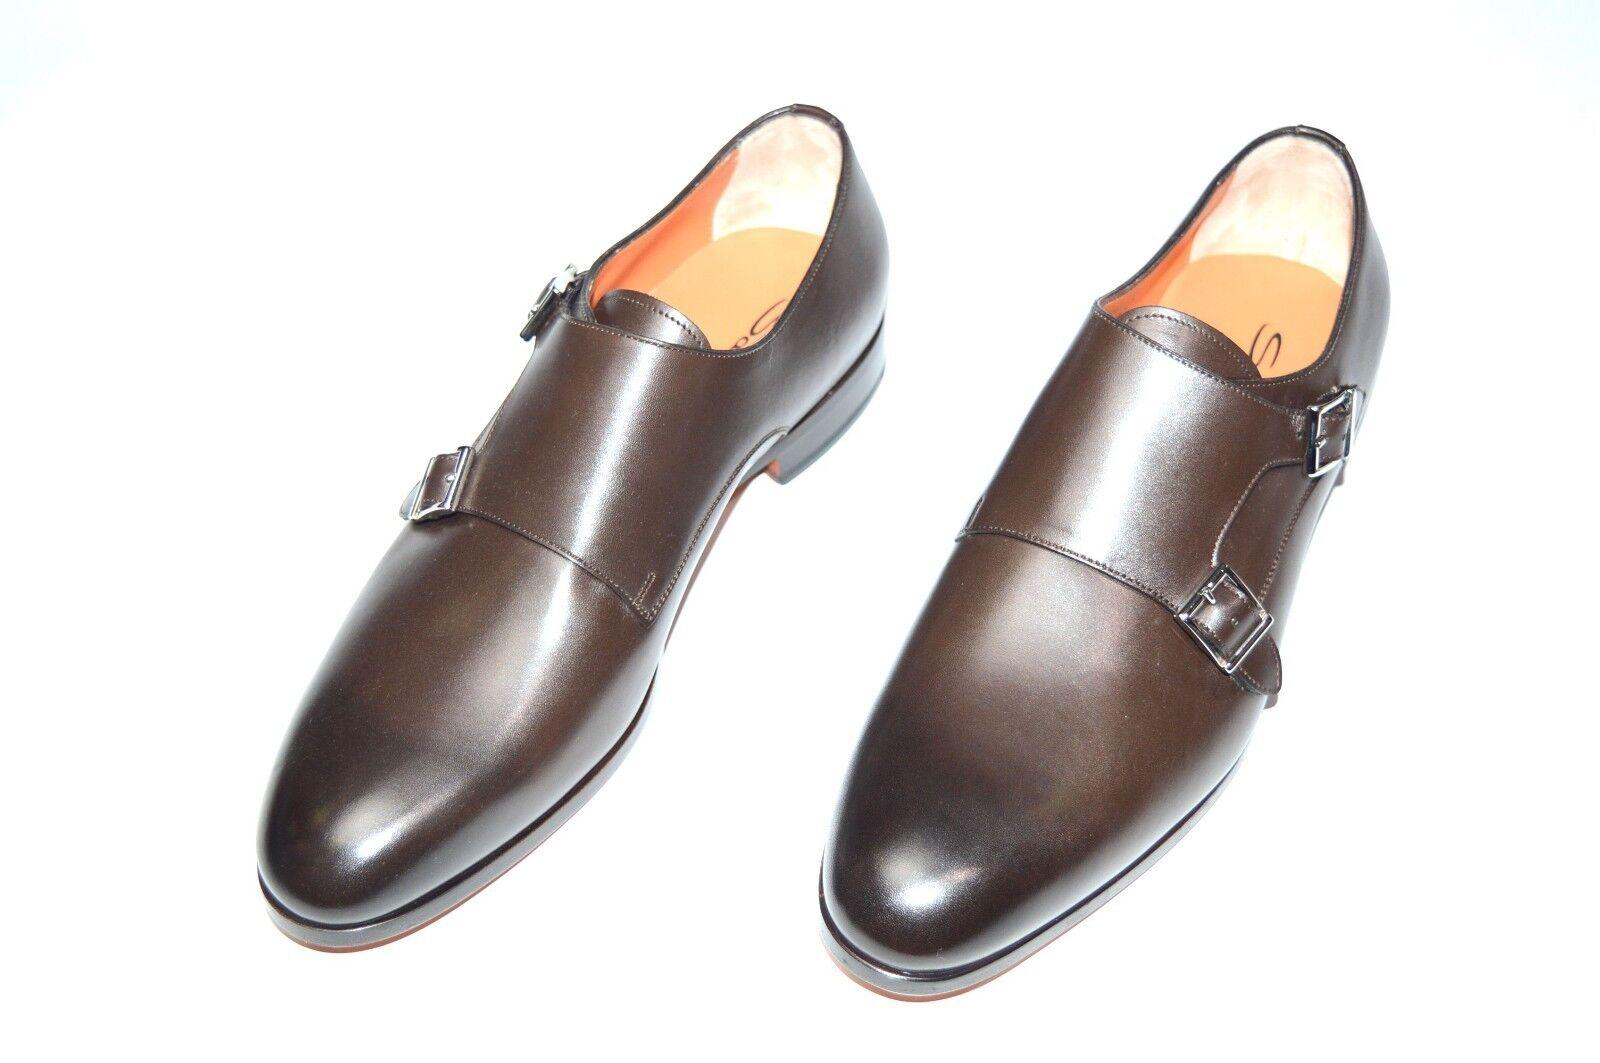 NEW SANTONI Dress Leather Shoes Monk Strap SIZE Eu 43 Uk 9 Us 10 (18R)